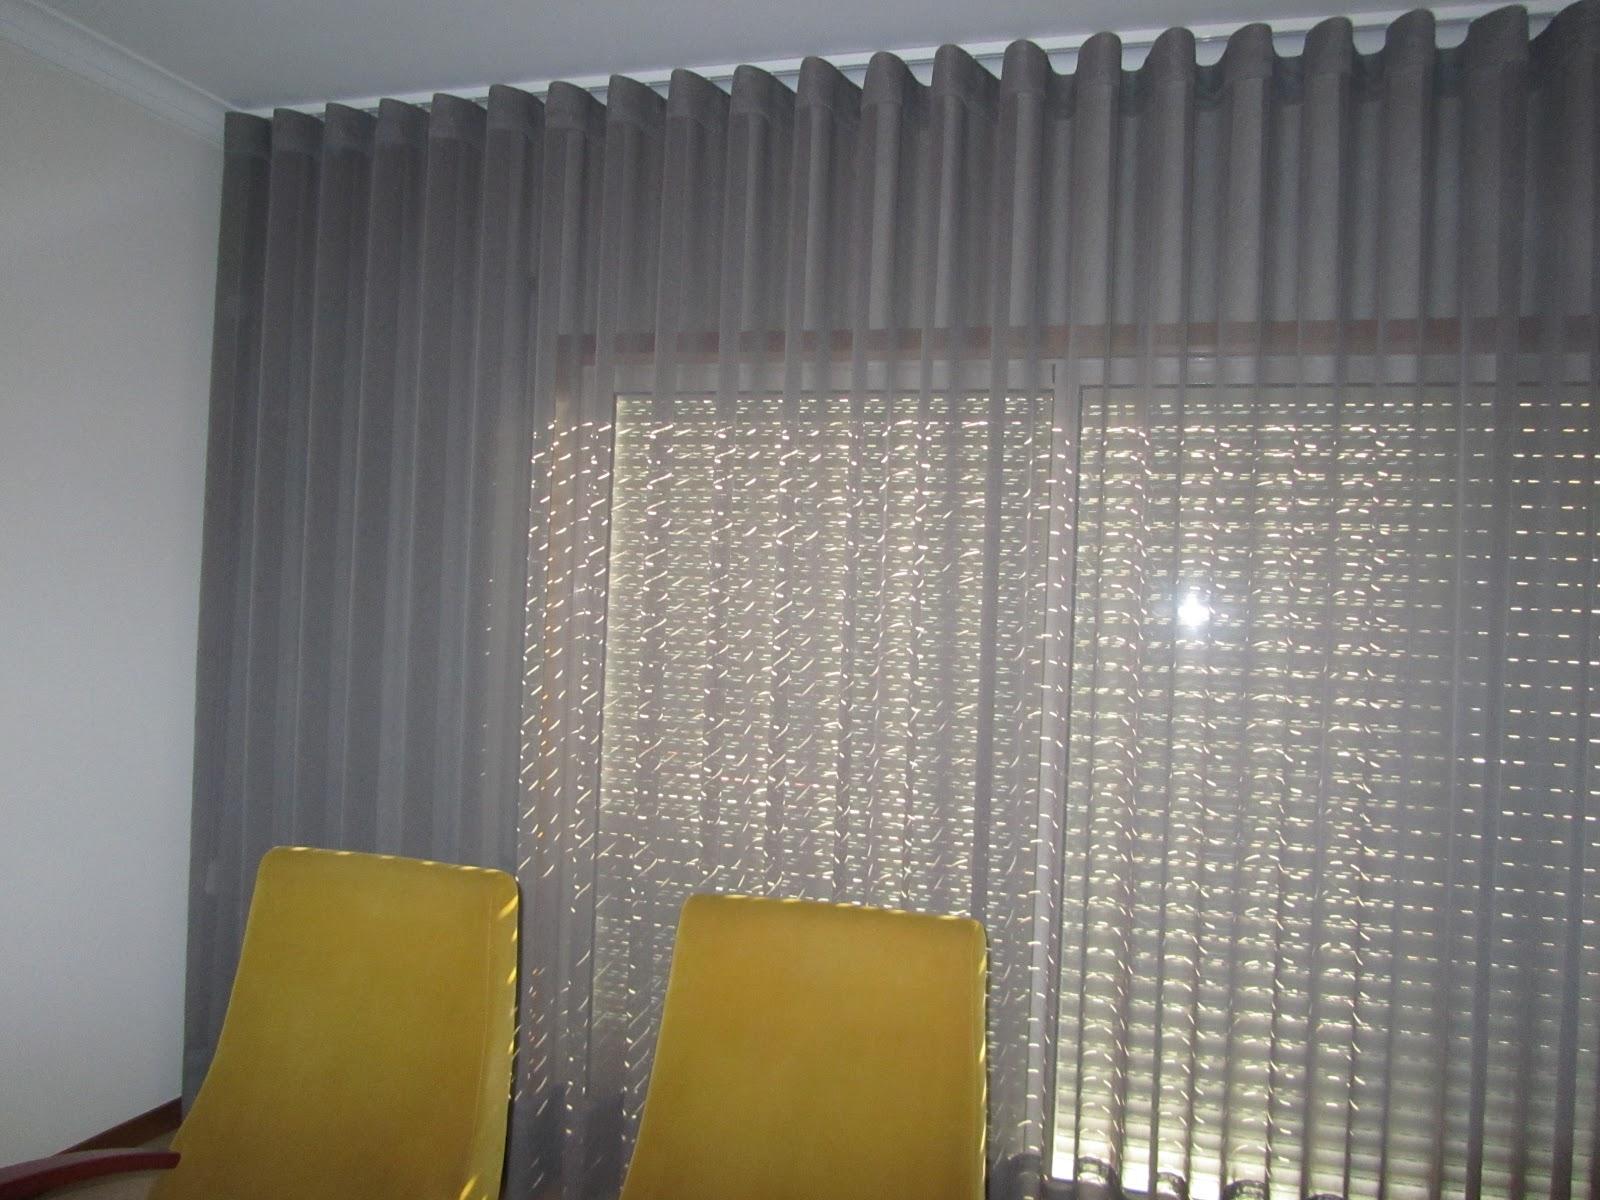 Noz moscada interiores cortinados for Tipos de ganchos para cortinas